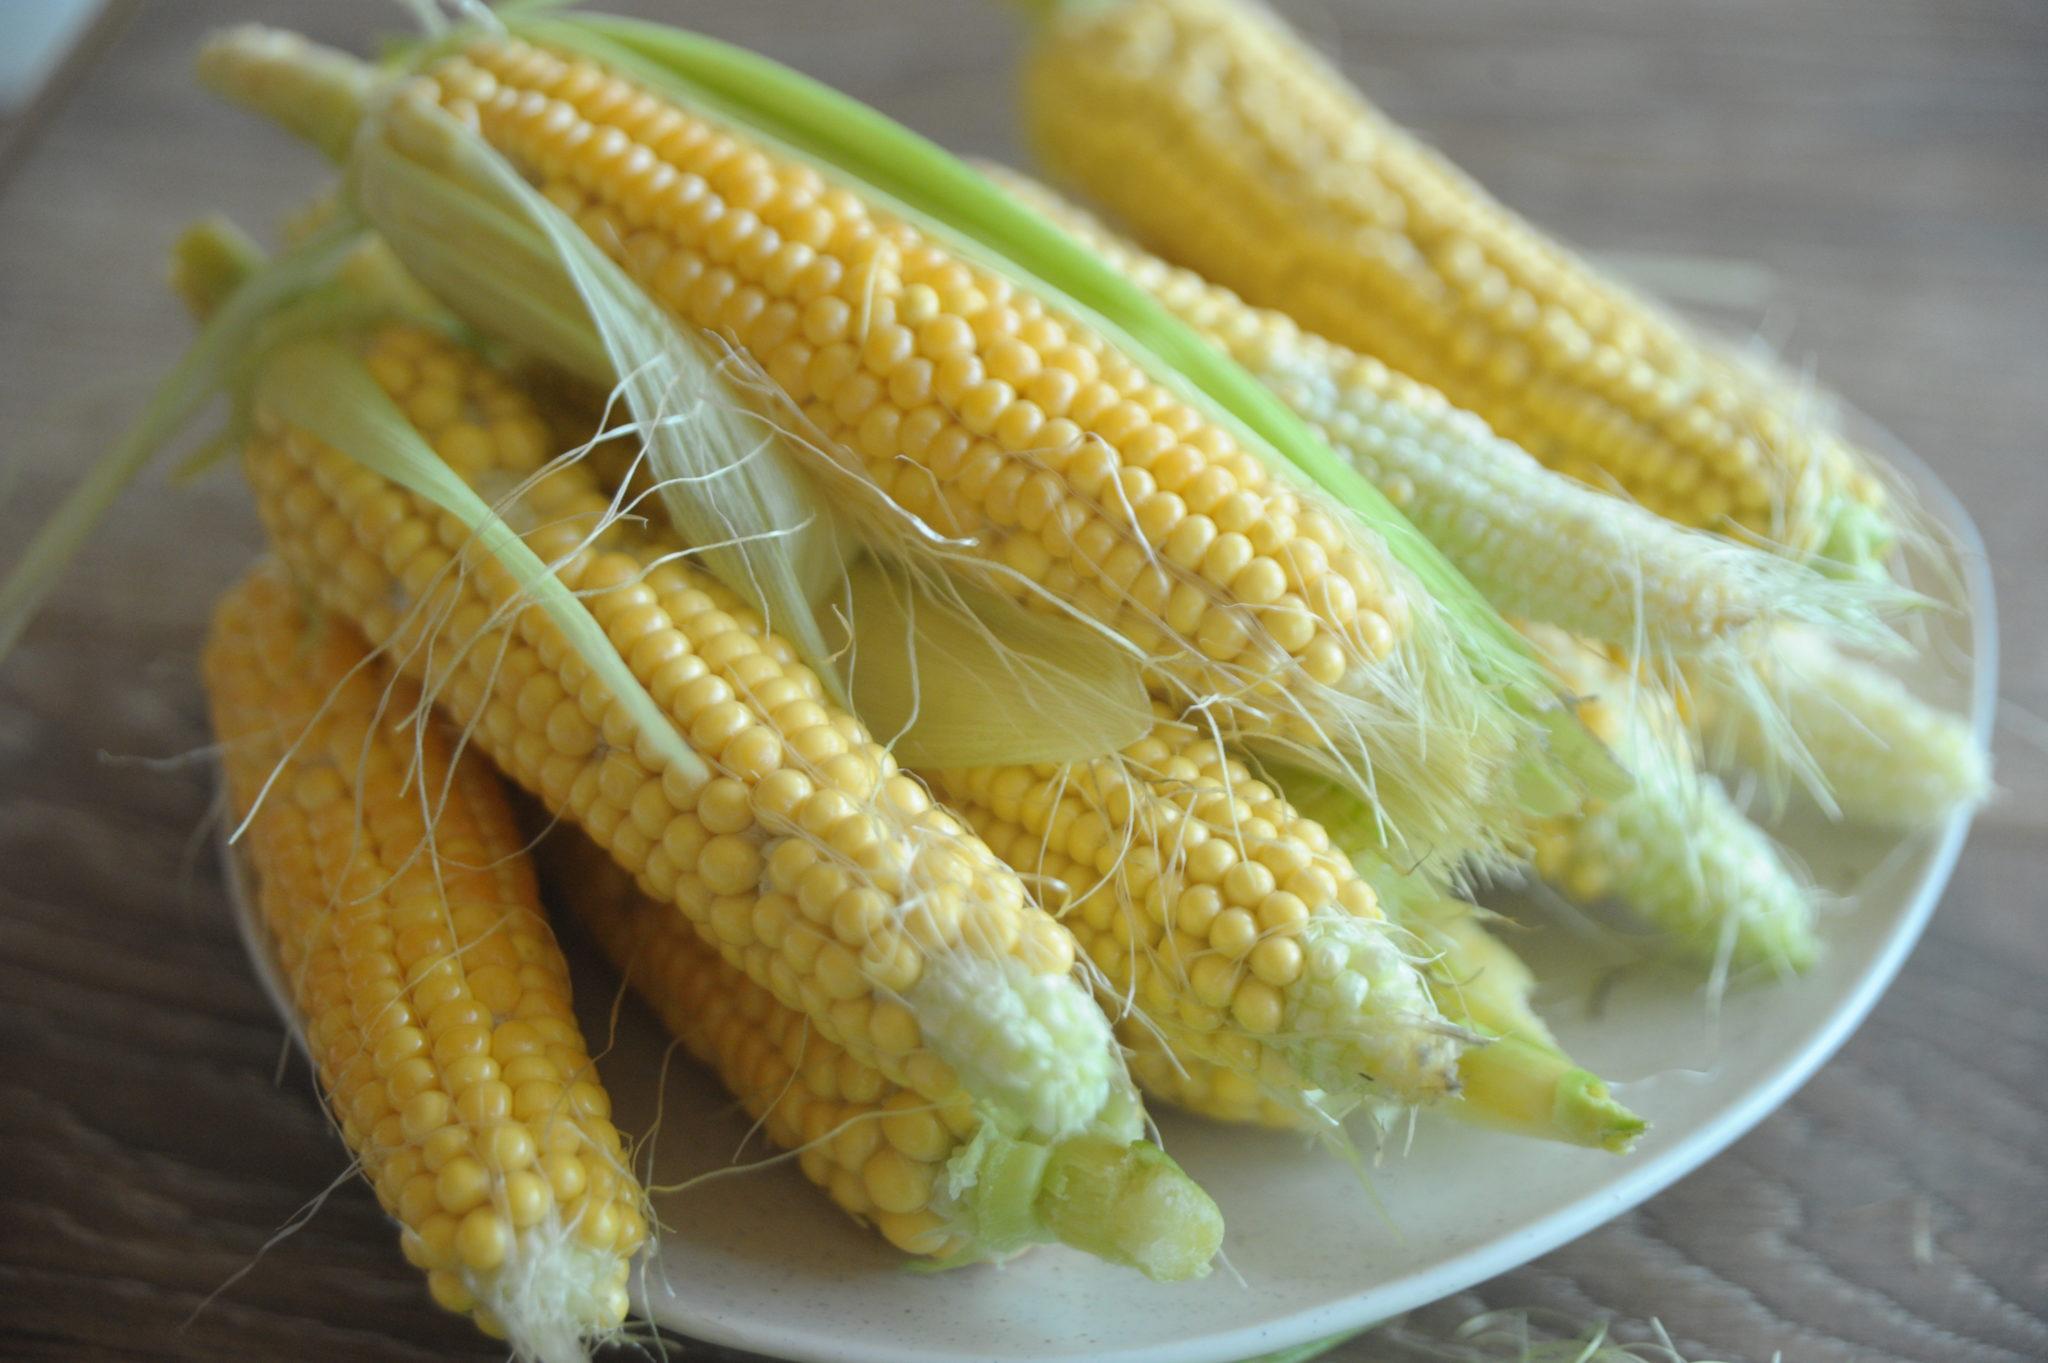 kukurydza w donicach